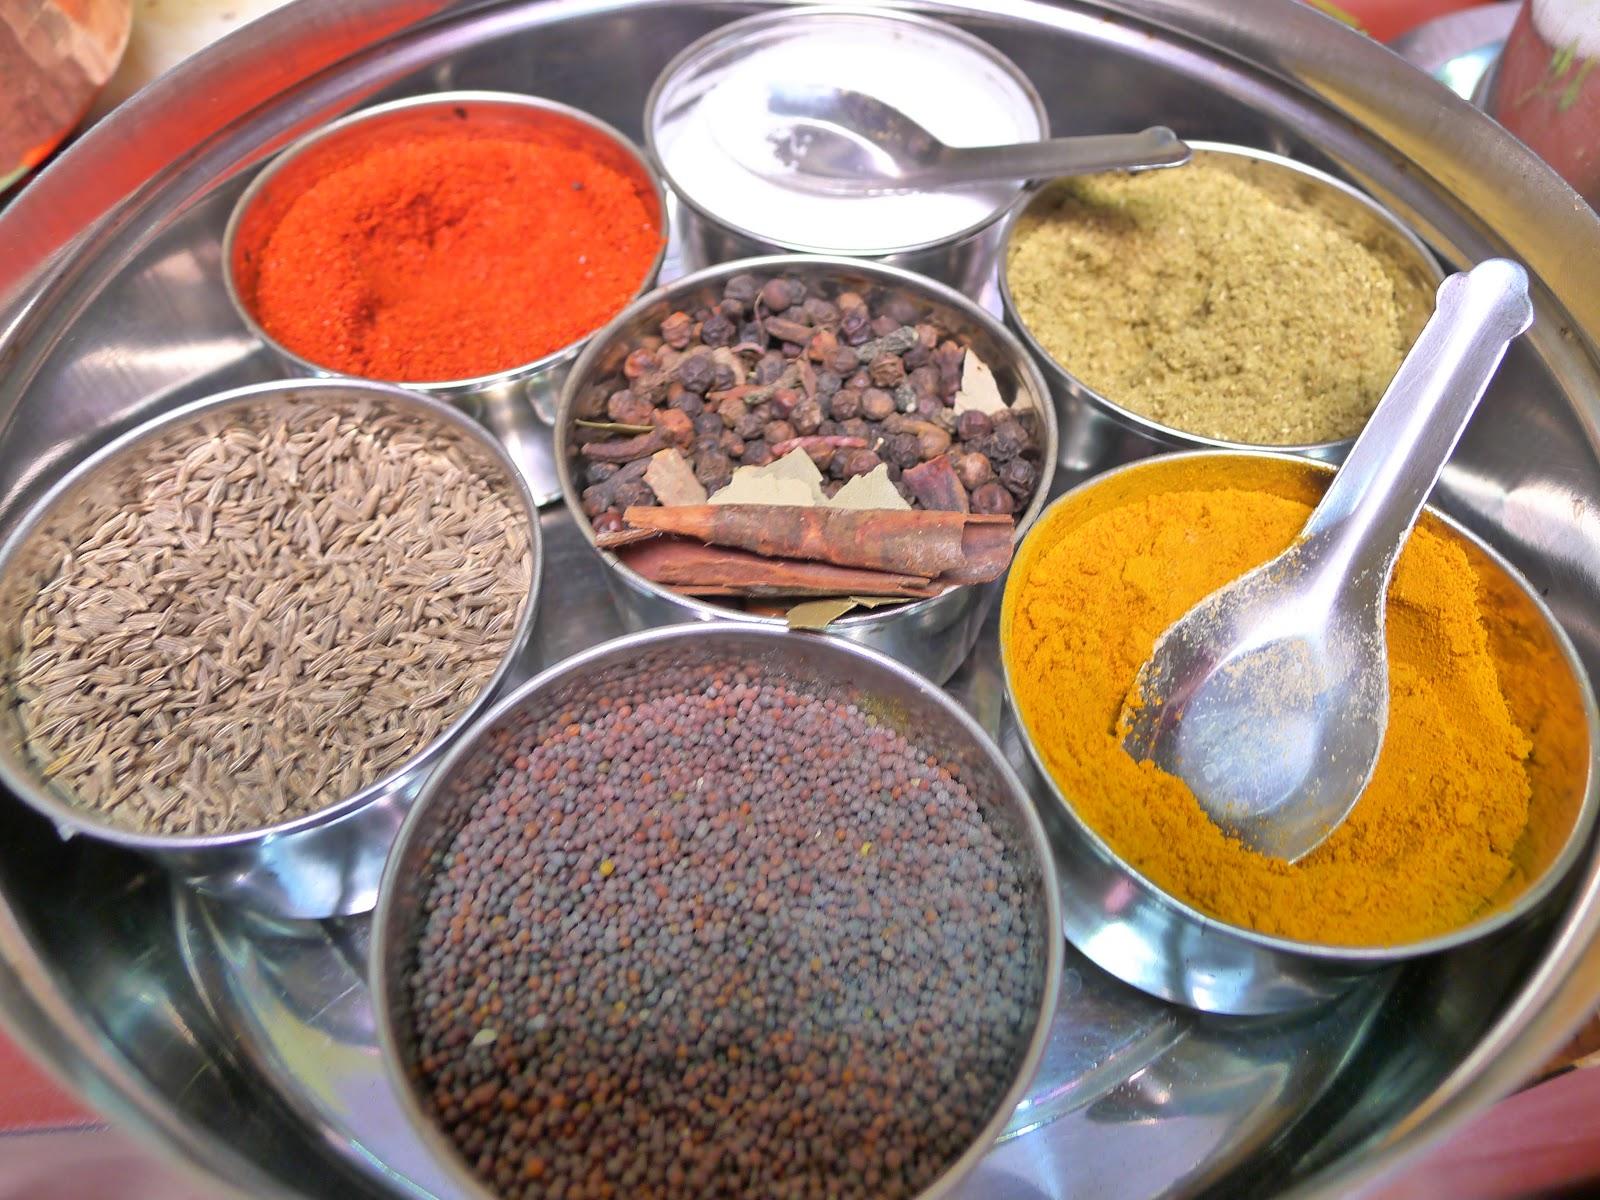 Trip 3 autour du globe the blog on apprend la - Cuisine indienne biryani ...